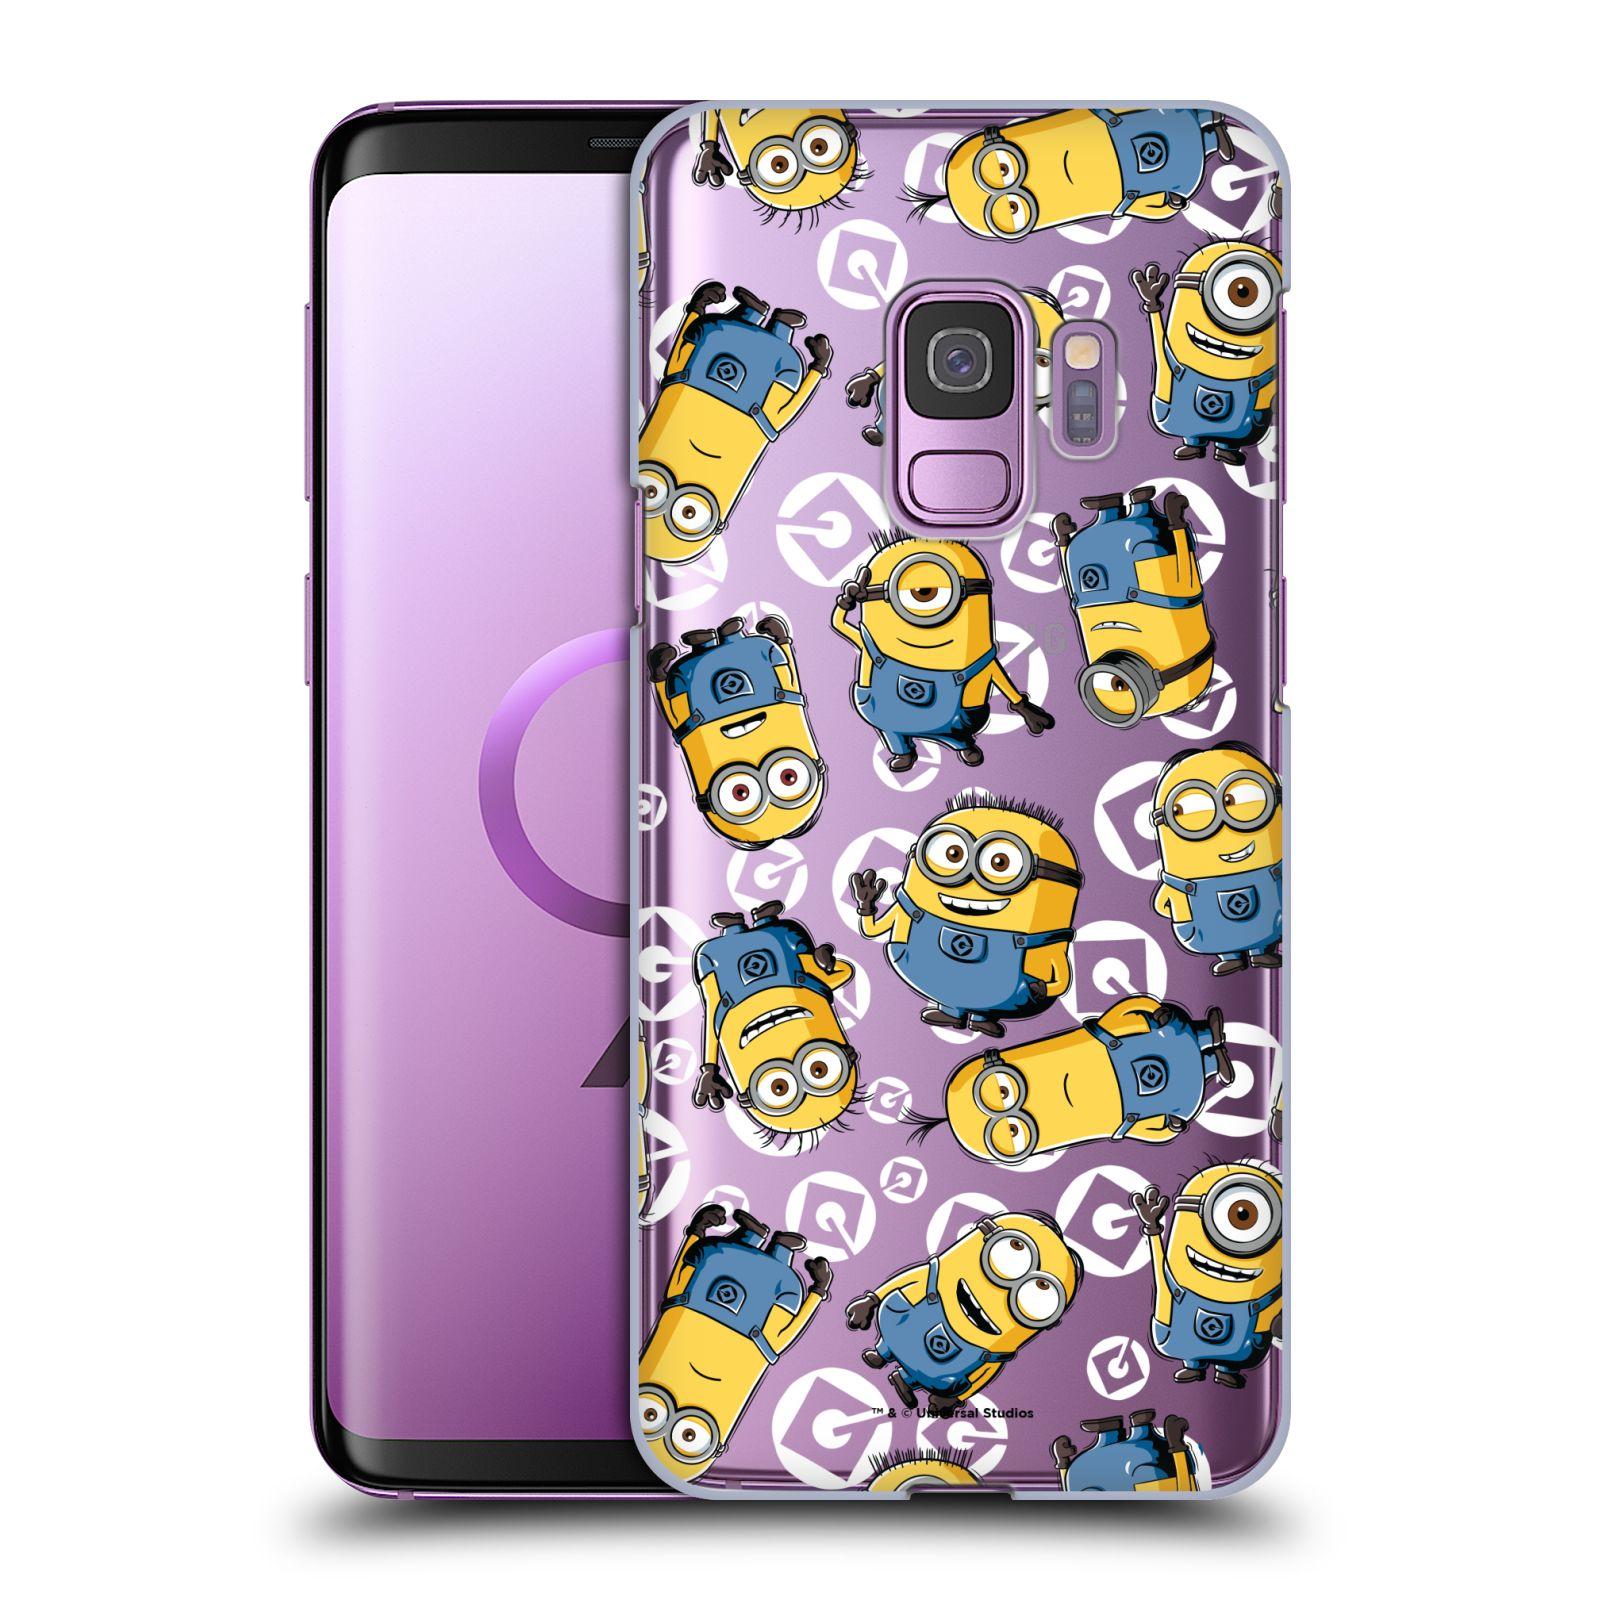 Plastové pouzdro na mobil Samsung Galaxy S9 - Head Case - Minion pattern z filmu Já, padouch - Despicable Me